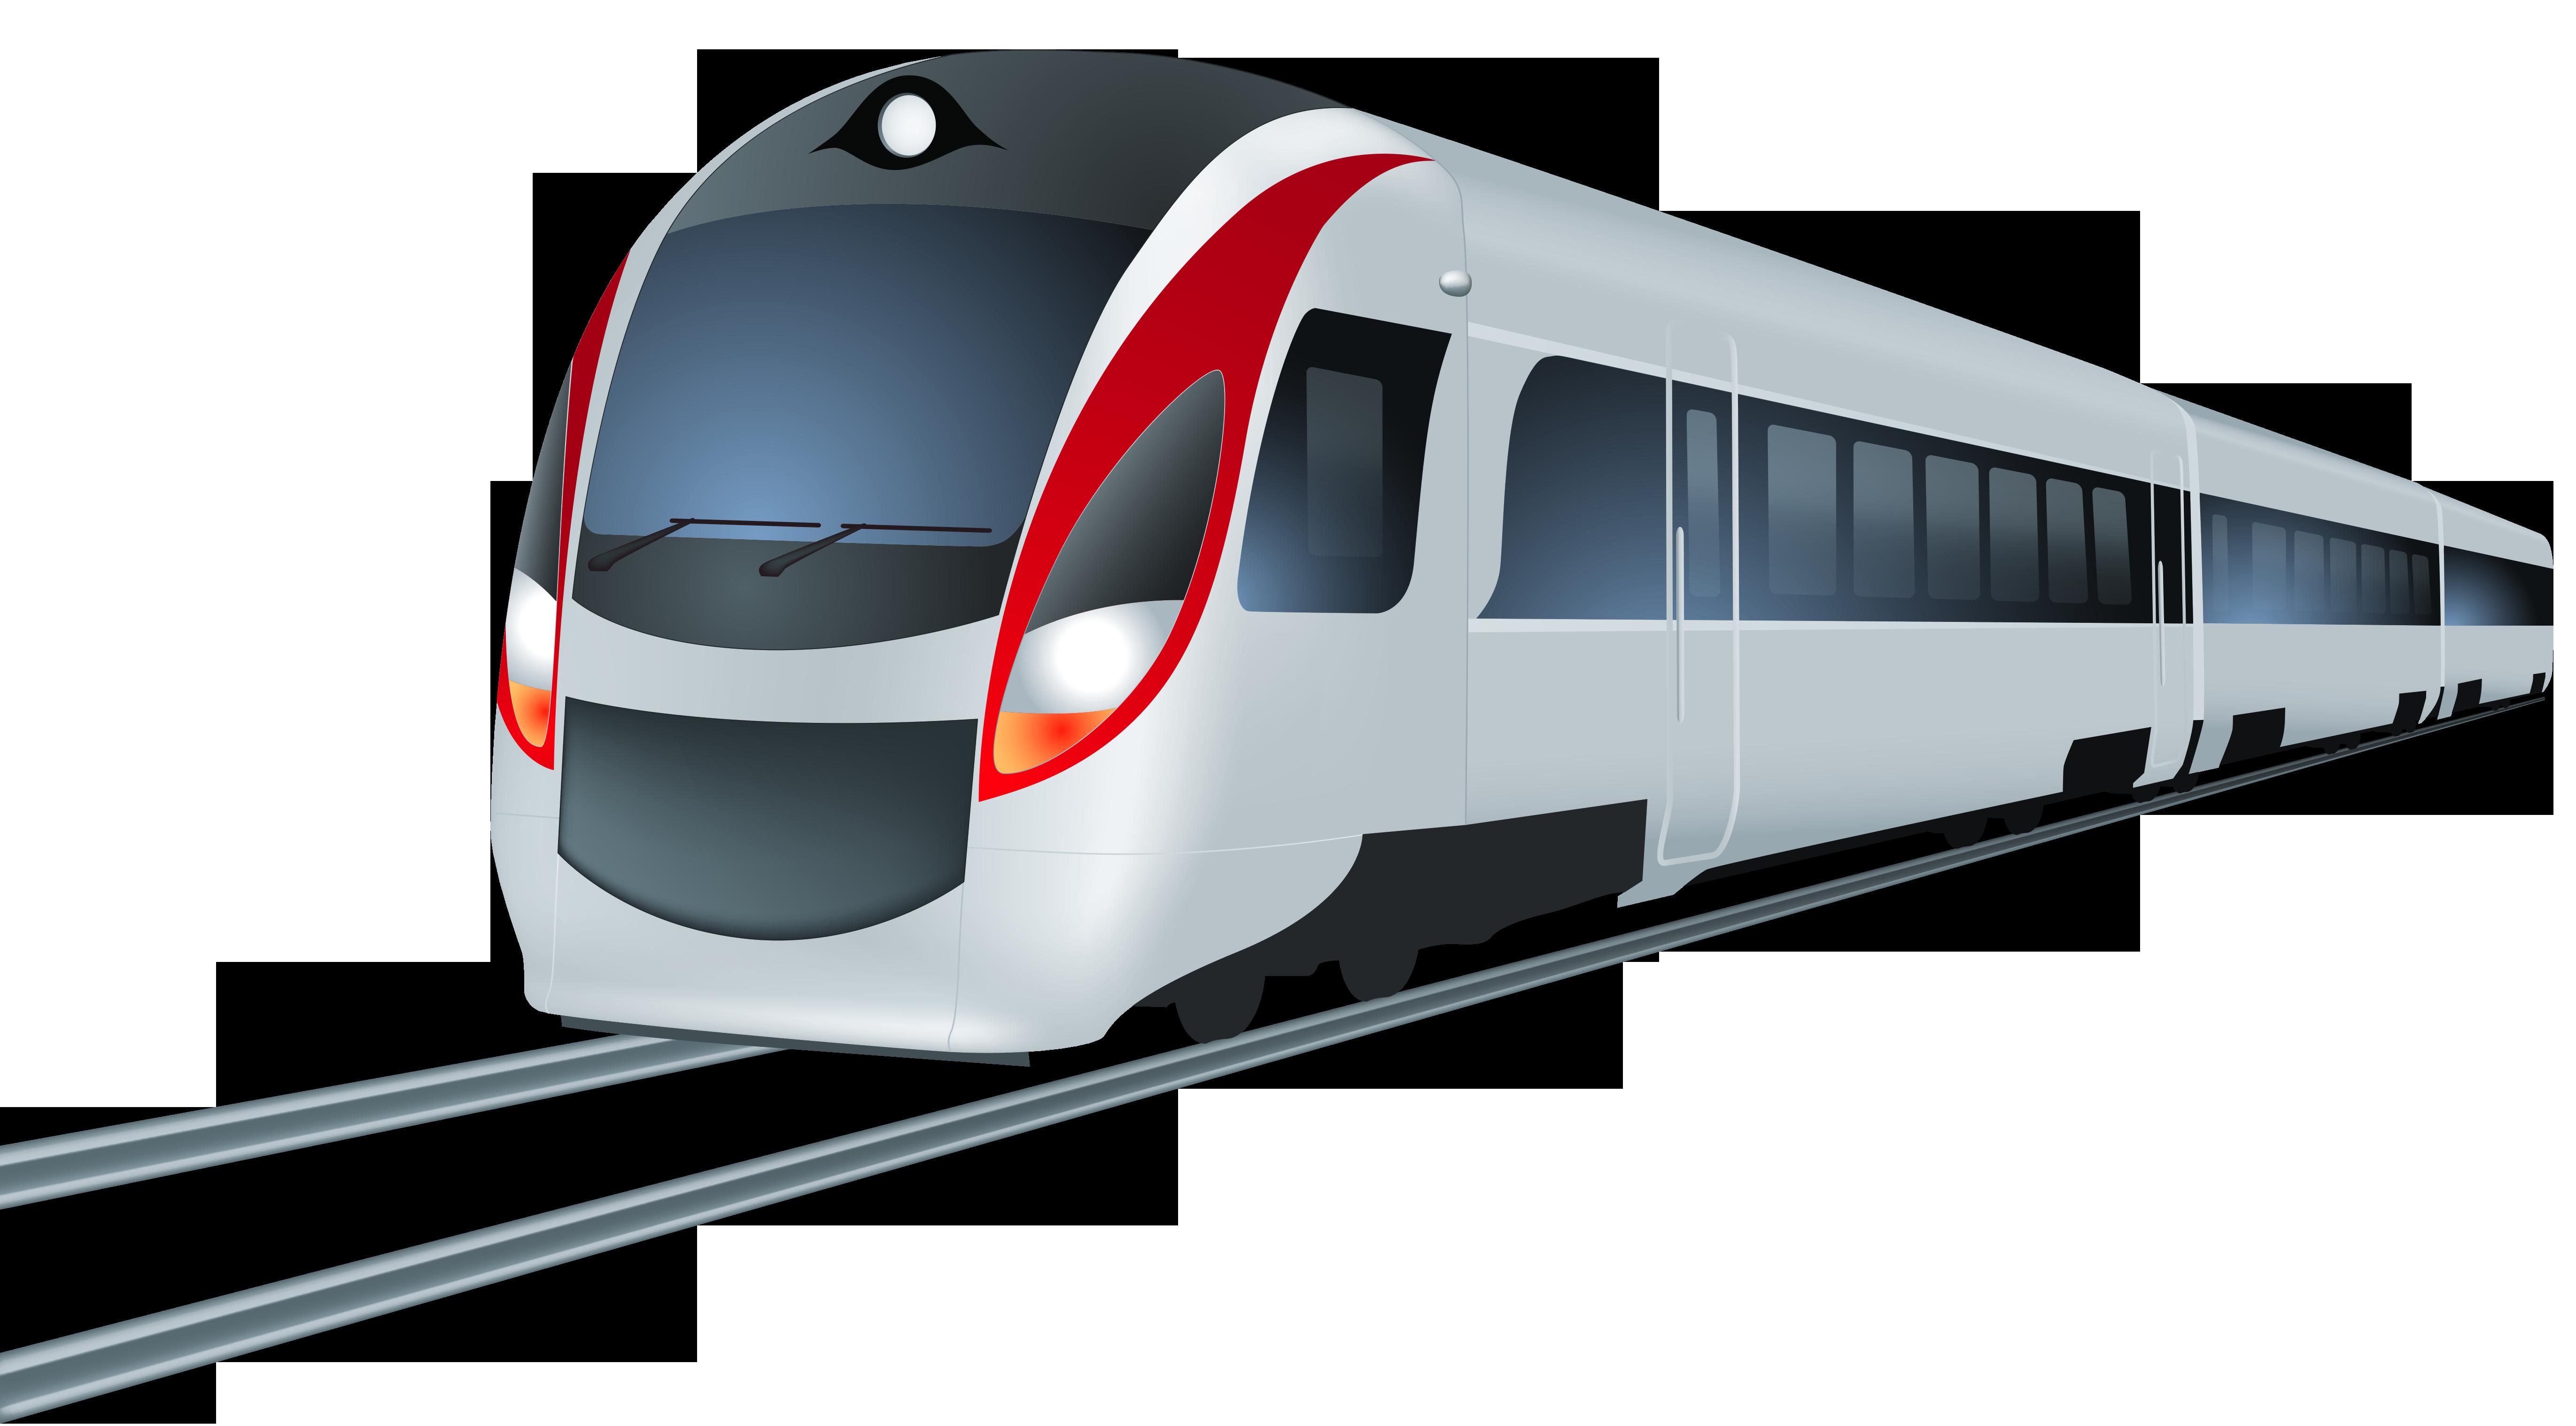 Train Png Clipart Train Clipart Train Clip Art